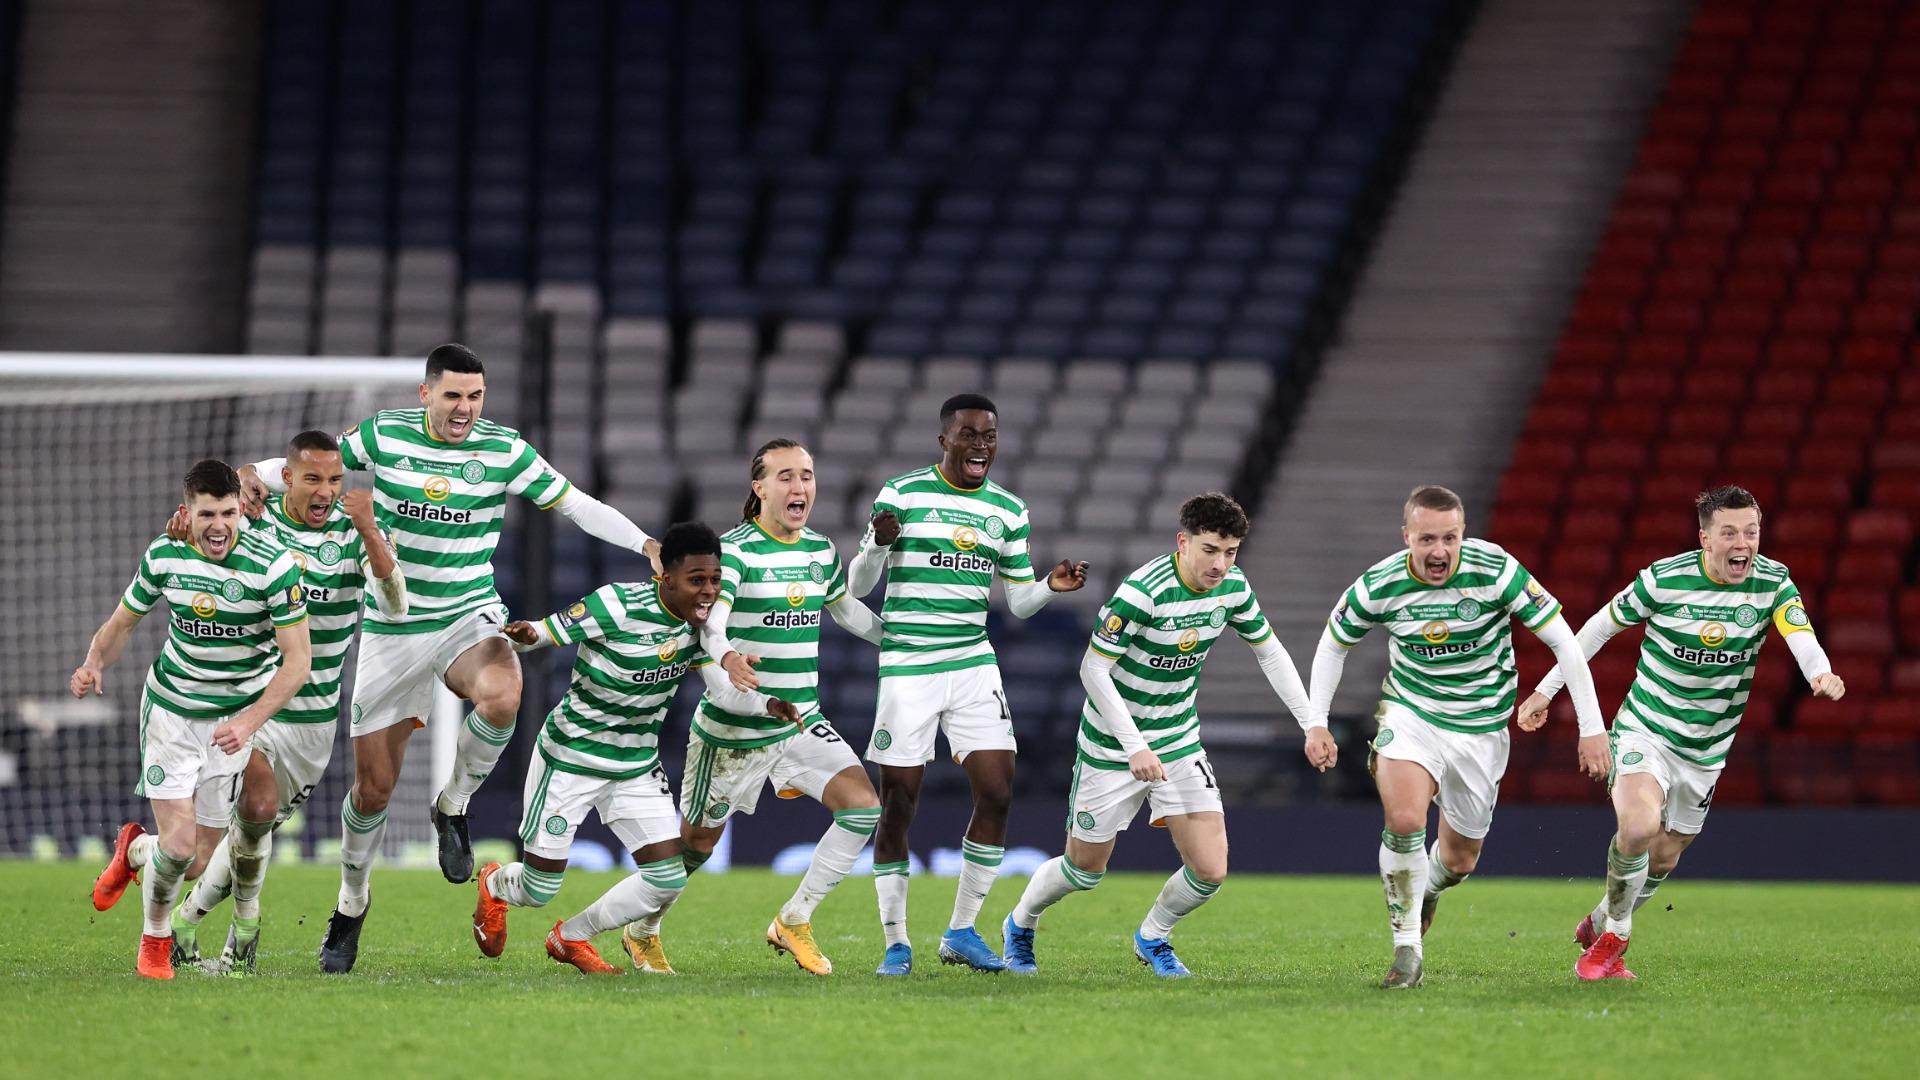 Celtic finally break Hearts in thriller to seal unprecedented quadruple treble